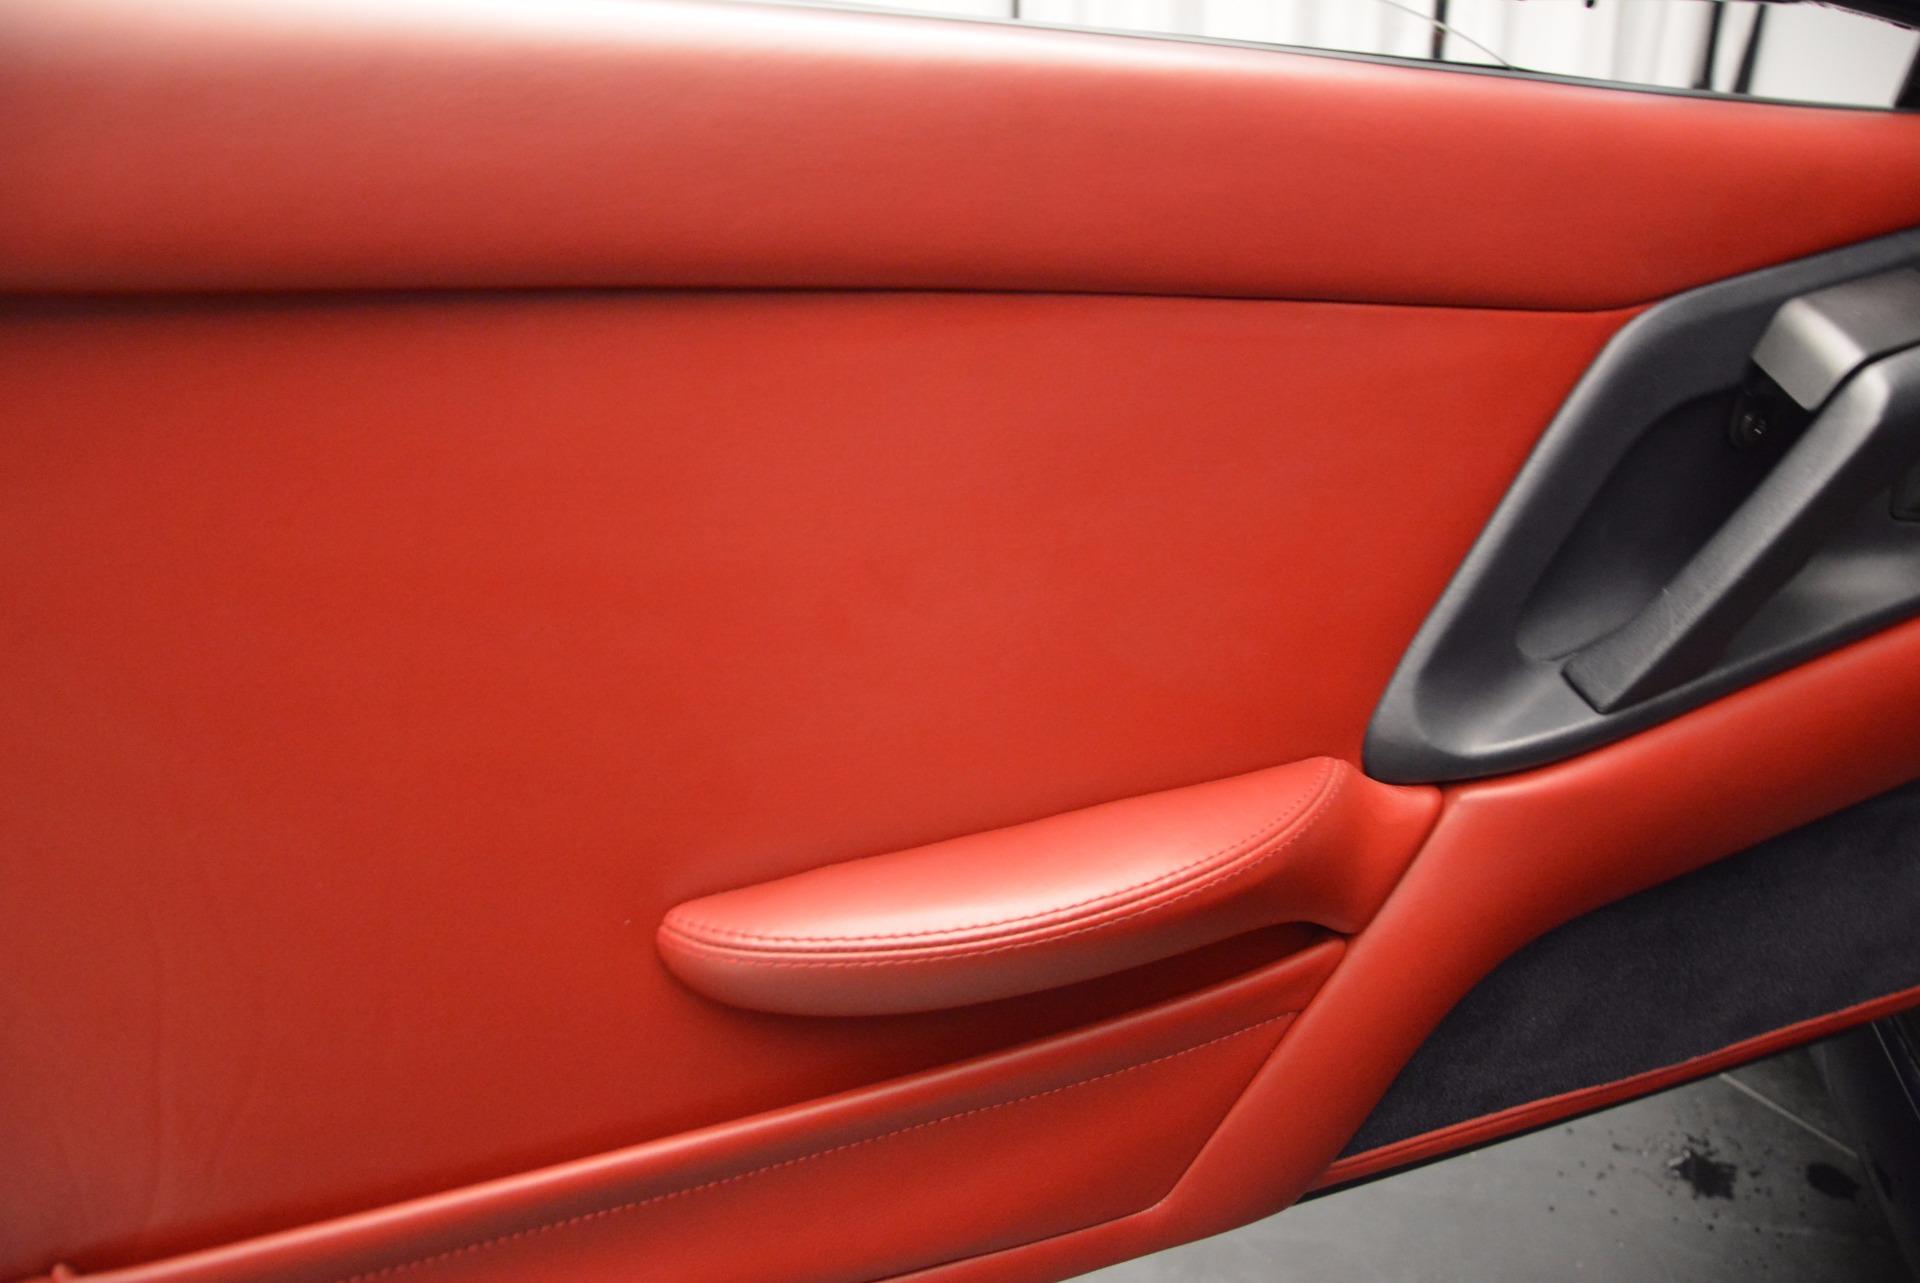 Used 1999 Ferrari 355 Berlinetta For Sale In Westport, CT 855_p17